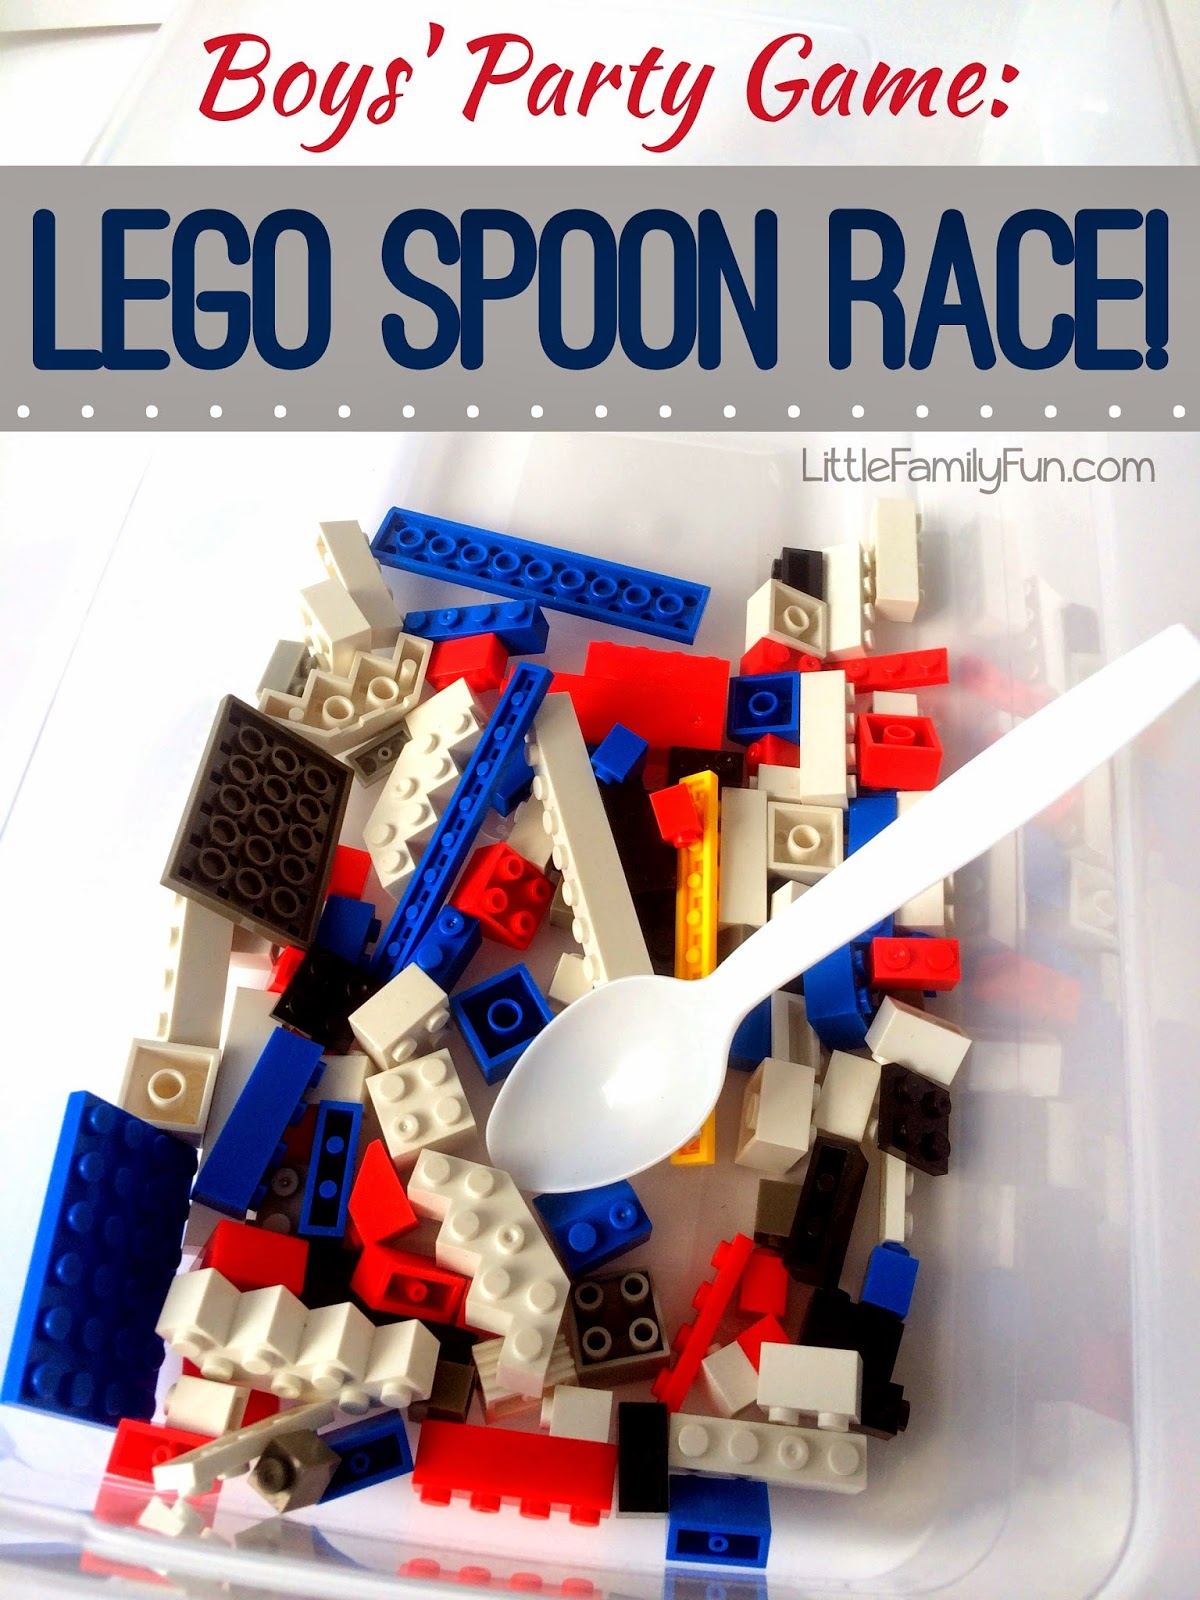 http://www.littlefamilyfun.com/2014/03/lego-spoon-race.html